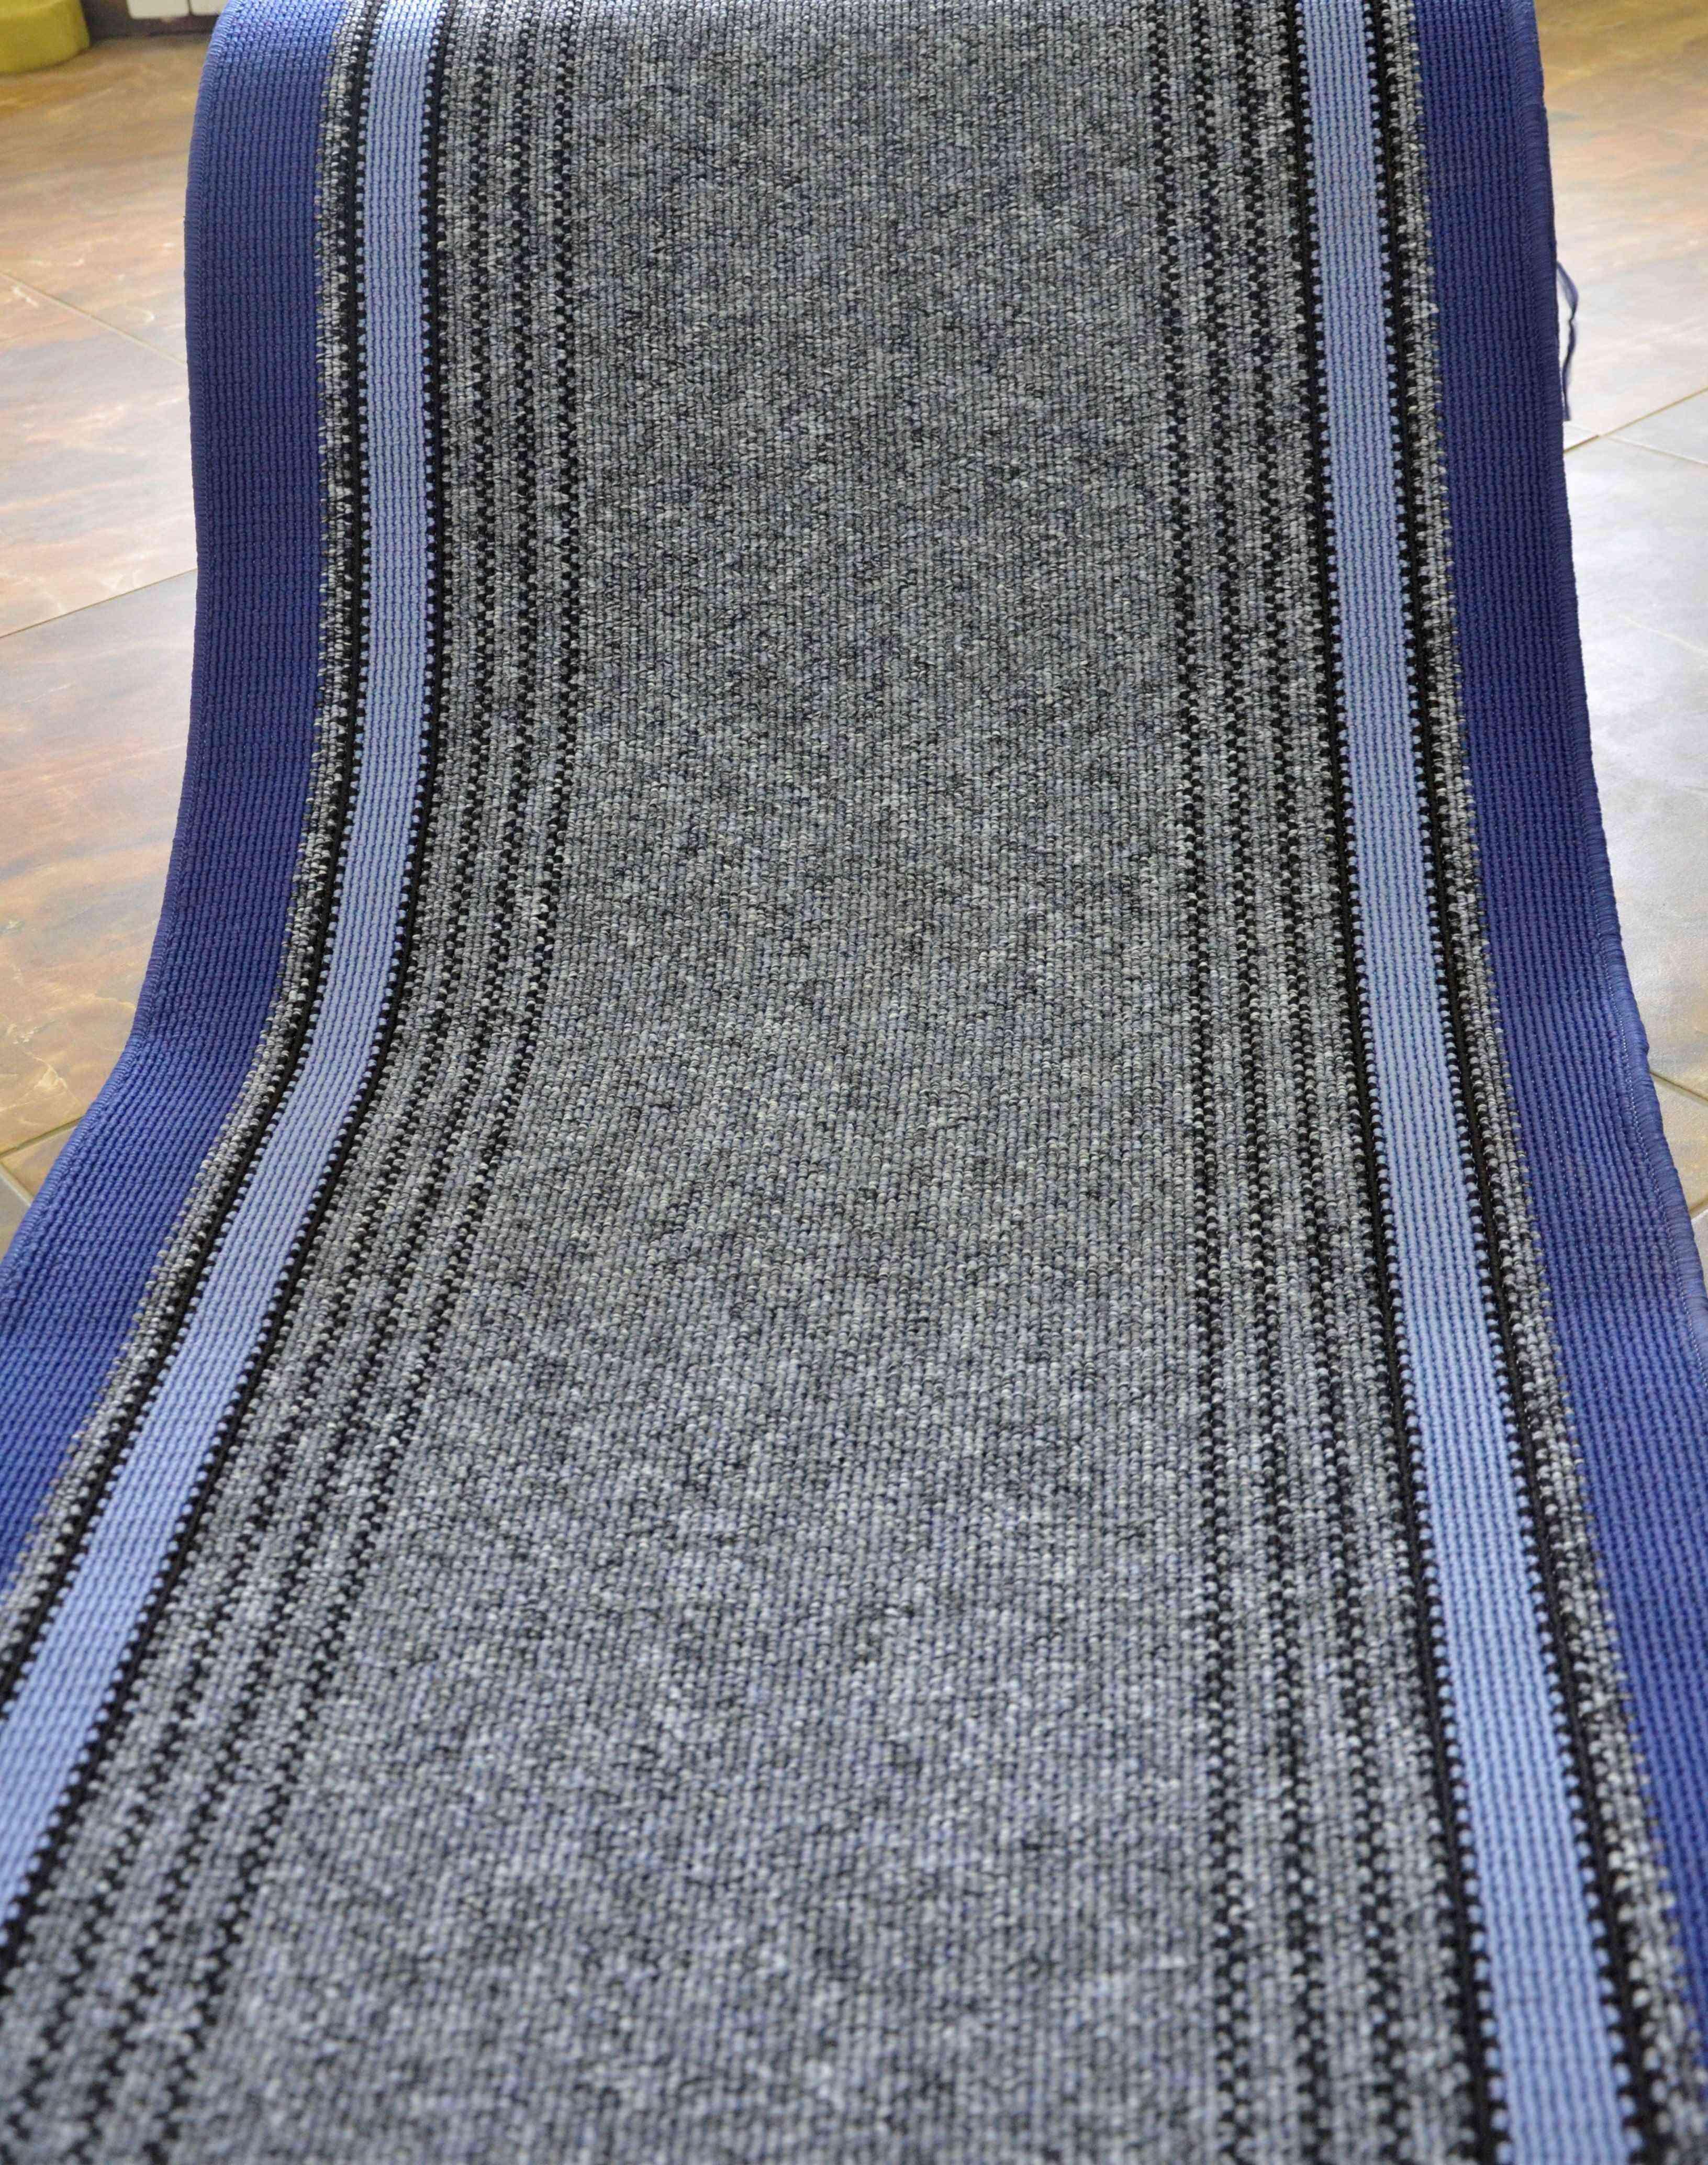 Traversa Covor, Saba 08, Albastru, 100x400 cm, 1350 gr/mp, 1x4 m 4